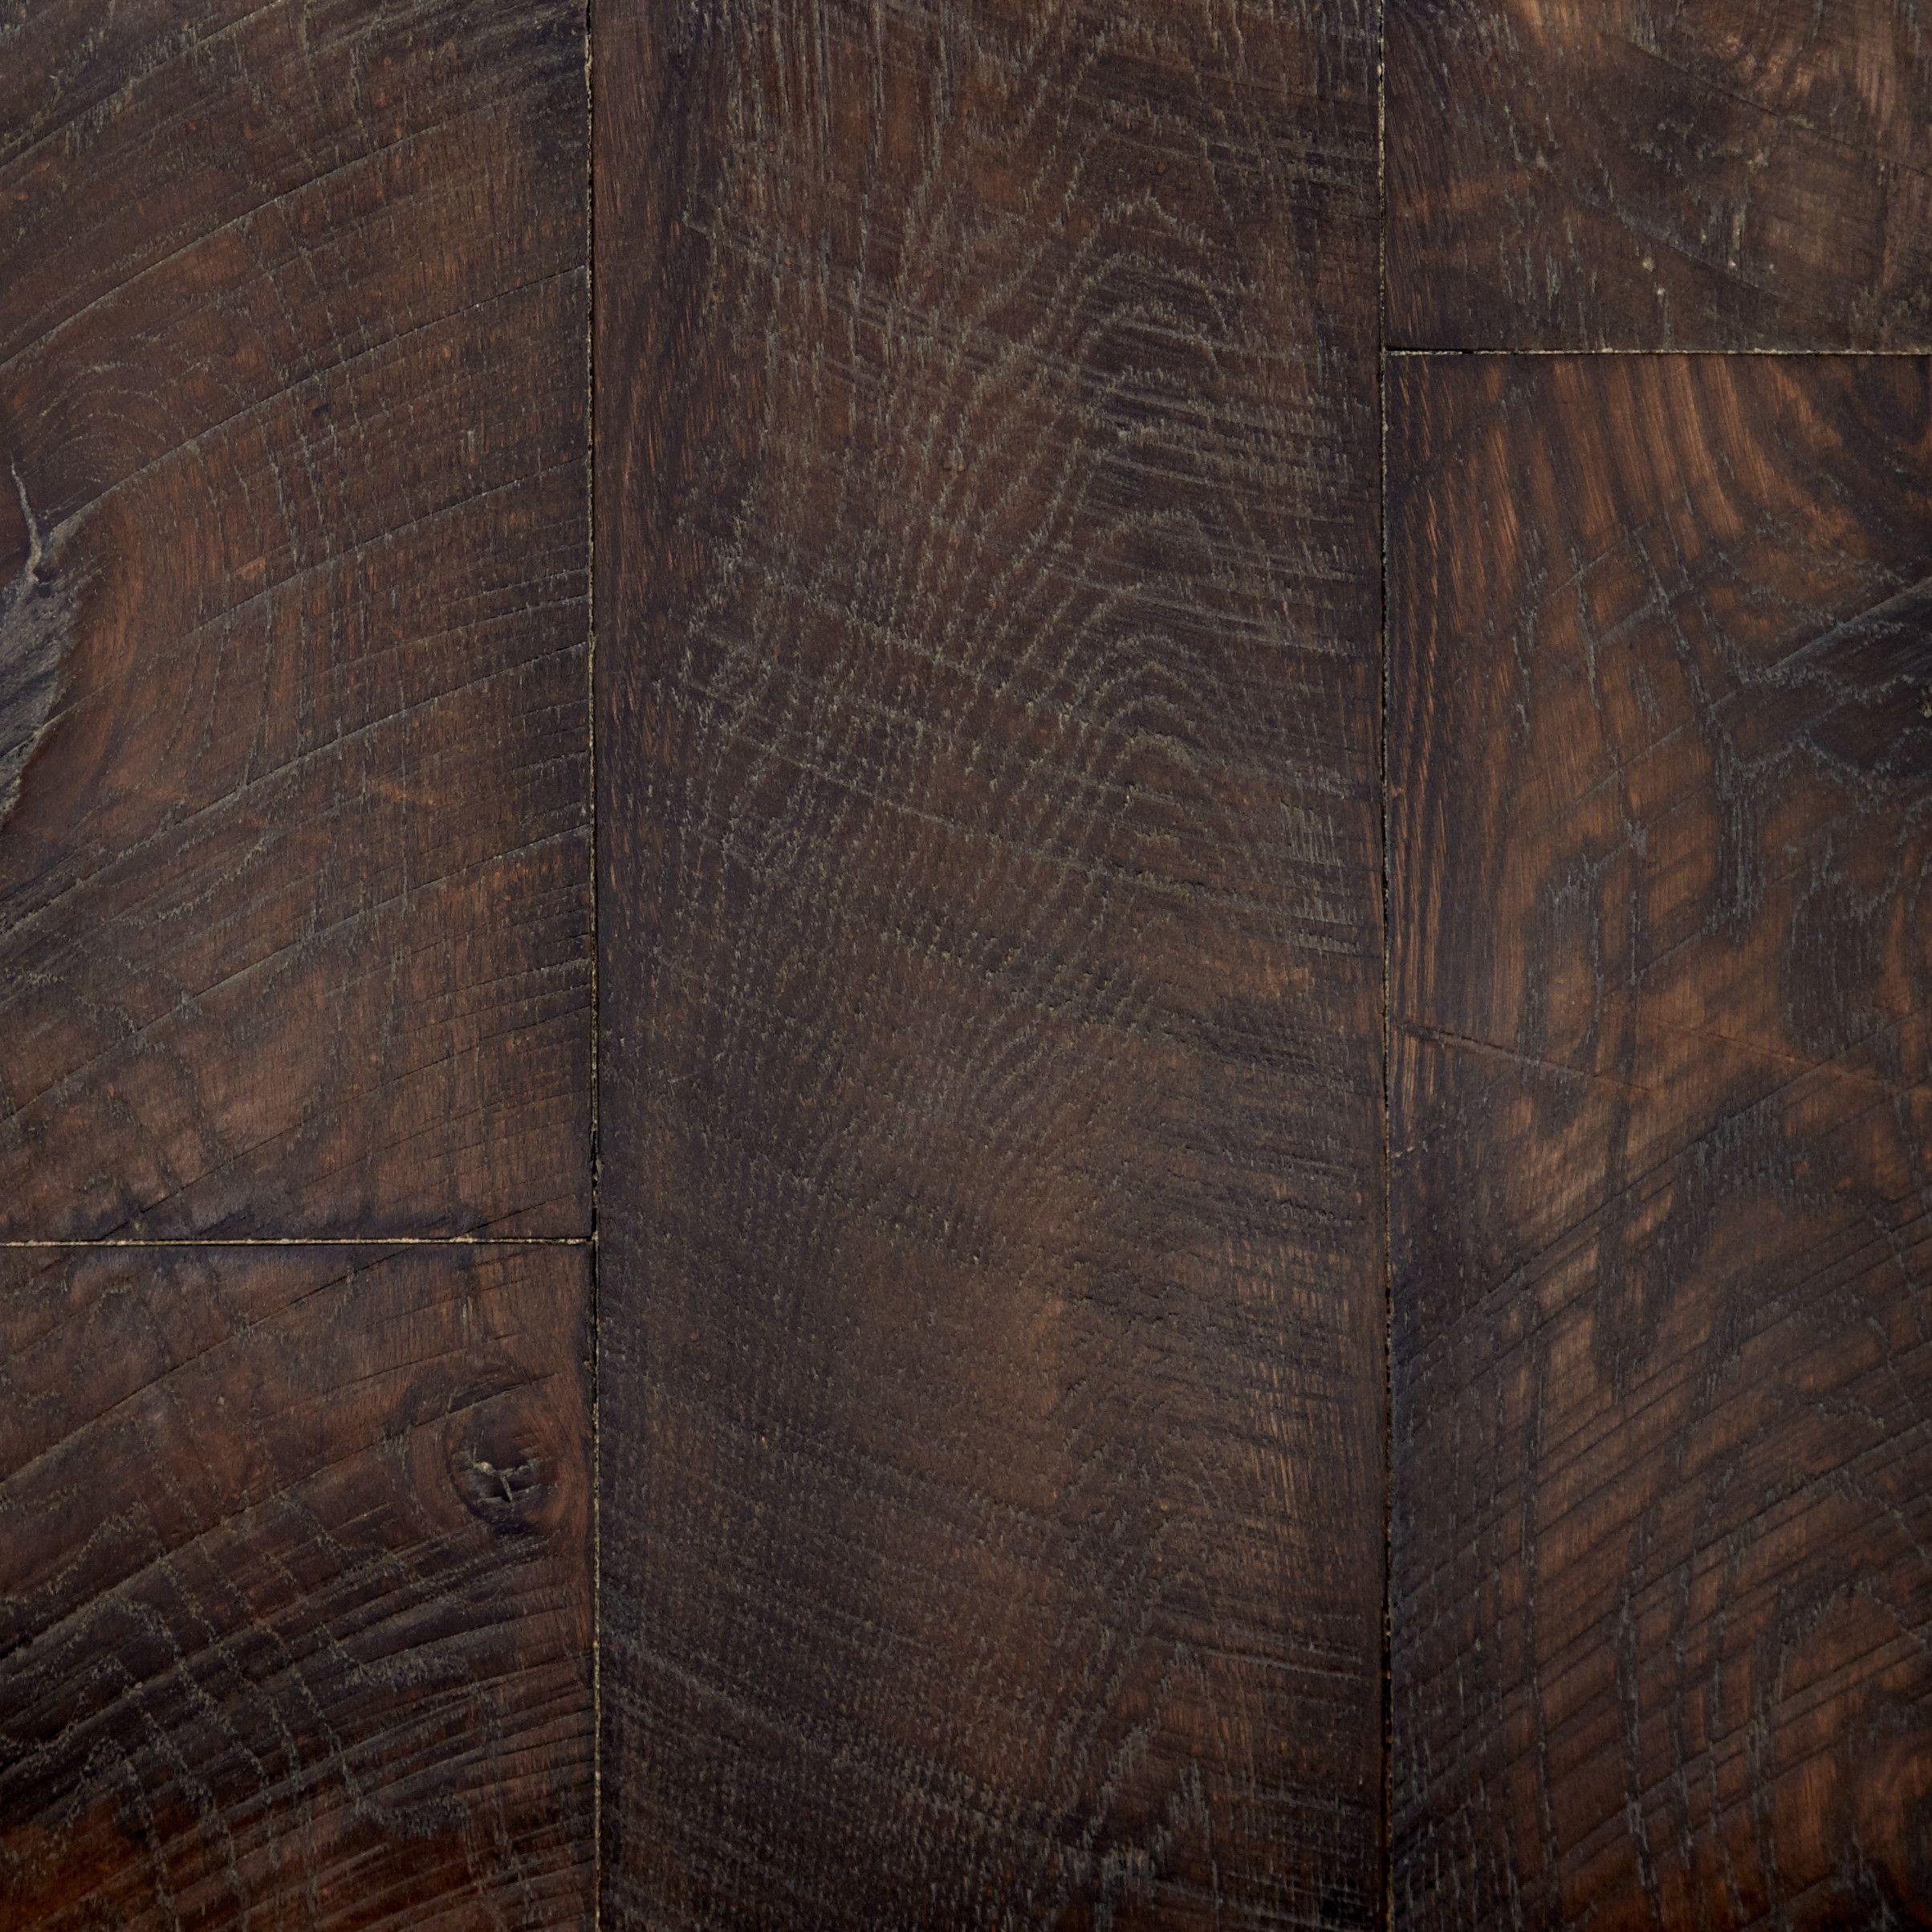 hand scraped hardwood floors dallas of reclaimed oak floor garenne flooring pinterest reclaimed oak within reclaimed oak floor garenne